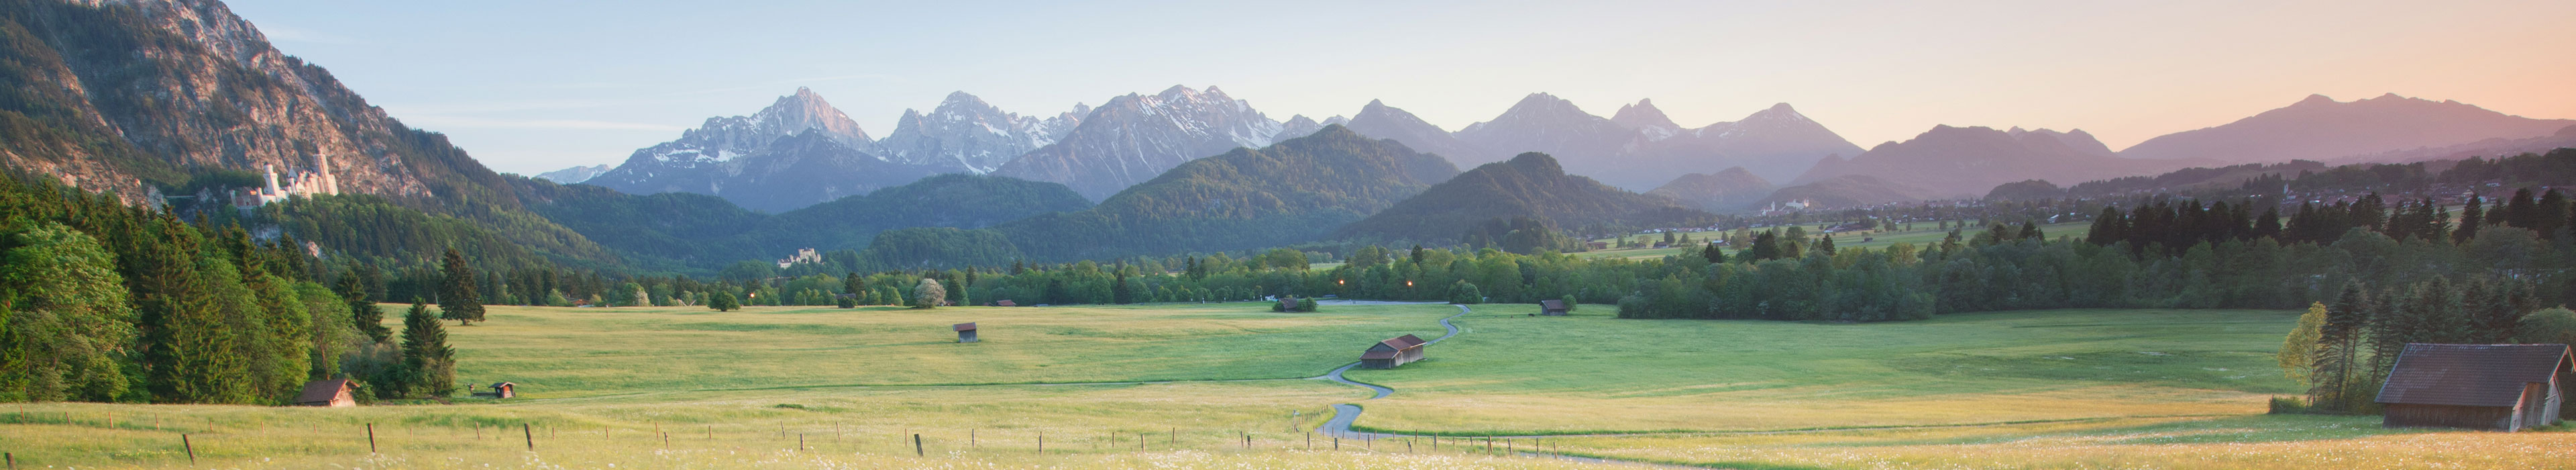 Terminvereinbarung: Terminvereinbarung - Steuerberatungskanzlei Bayern